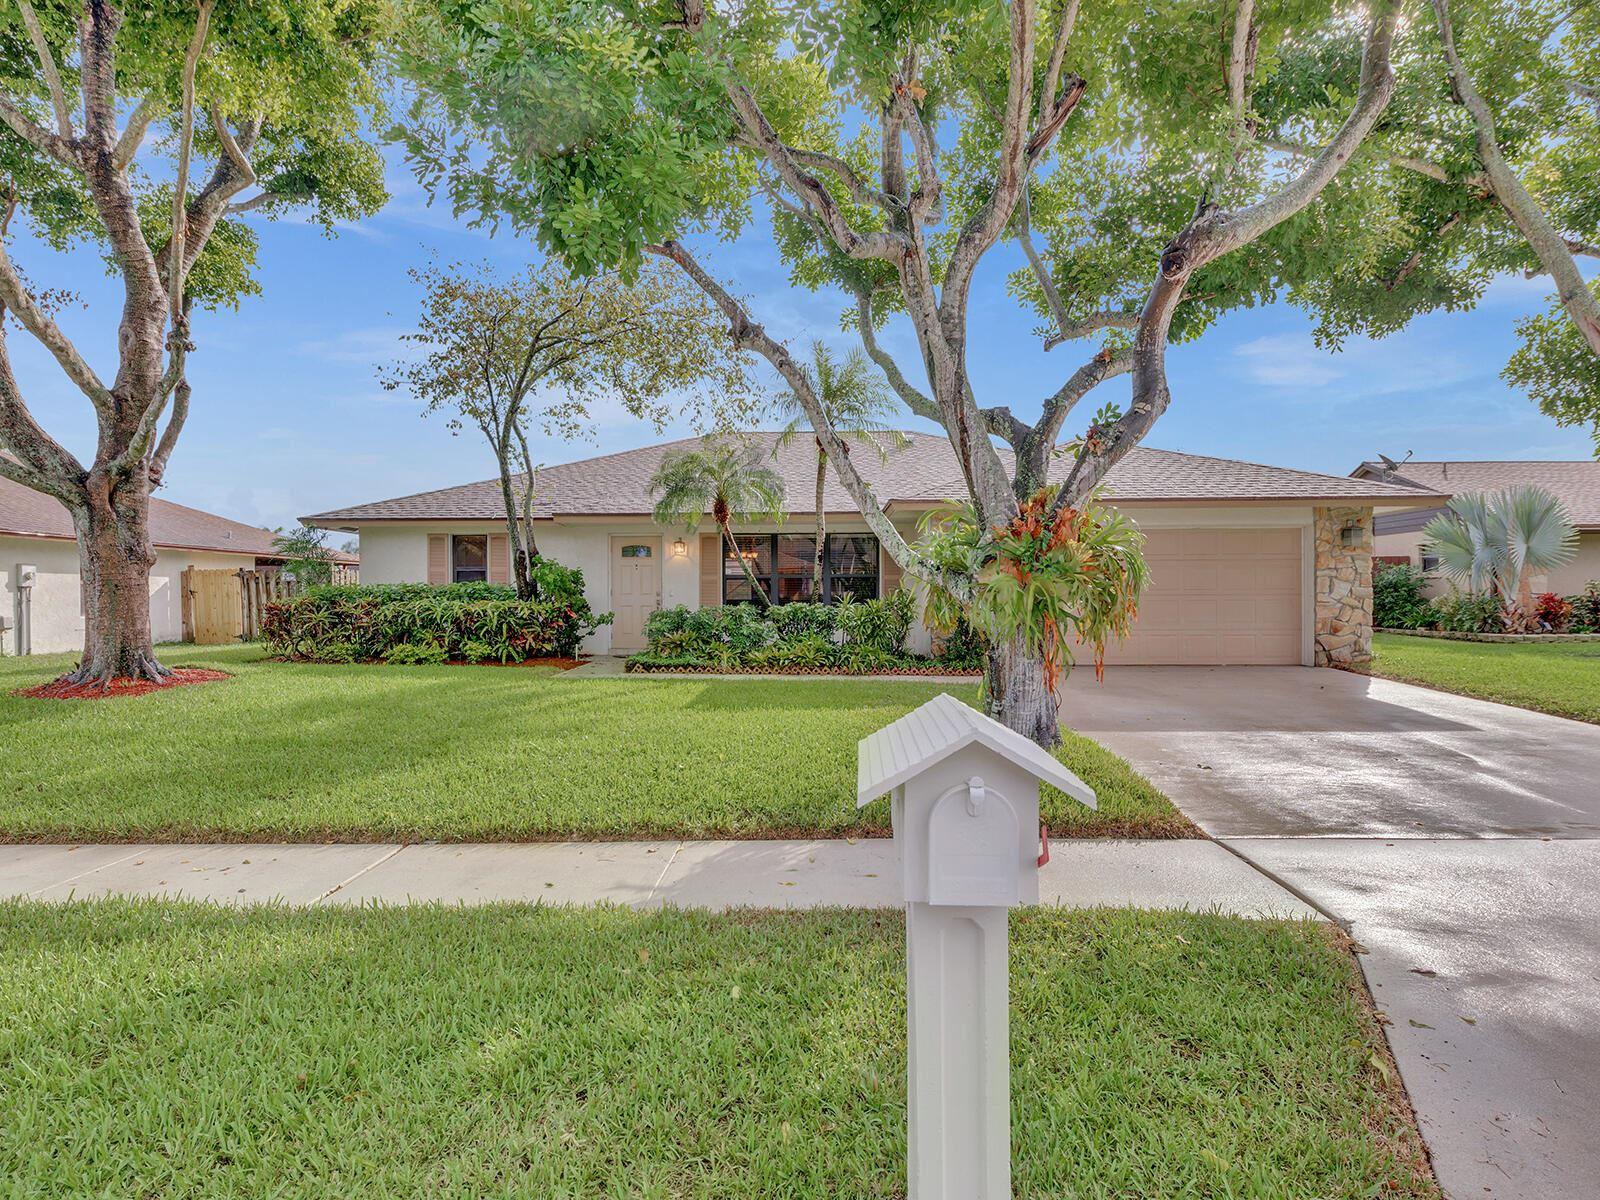 10714 Ranchipur Street, Boynton Beach, FL 33437 - MLS#: RX-10754330